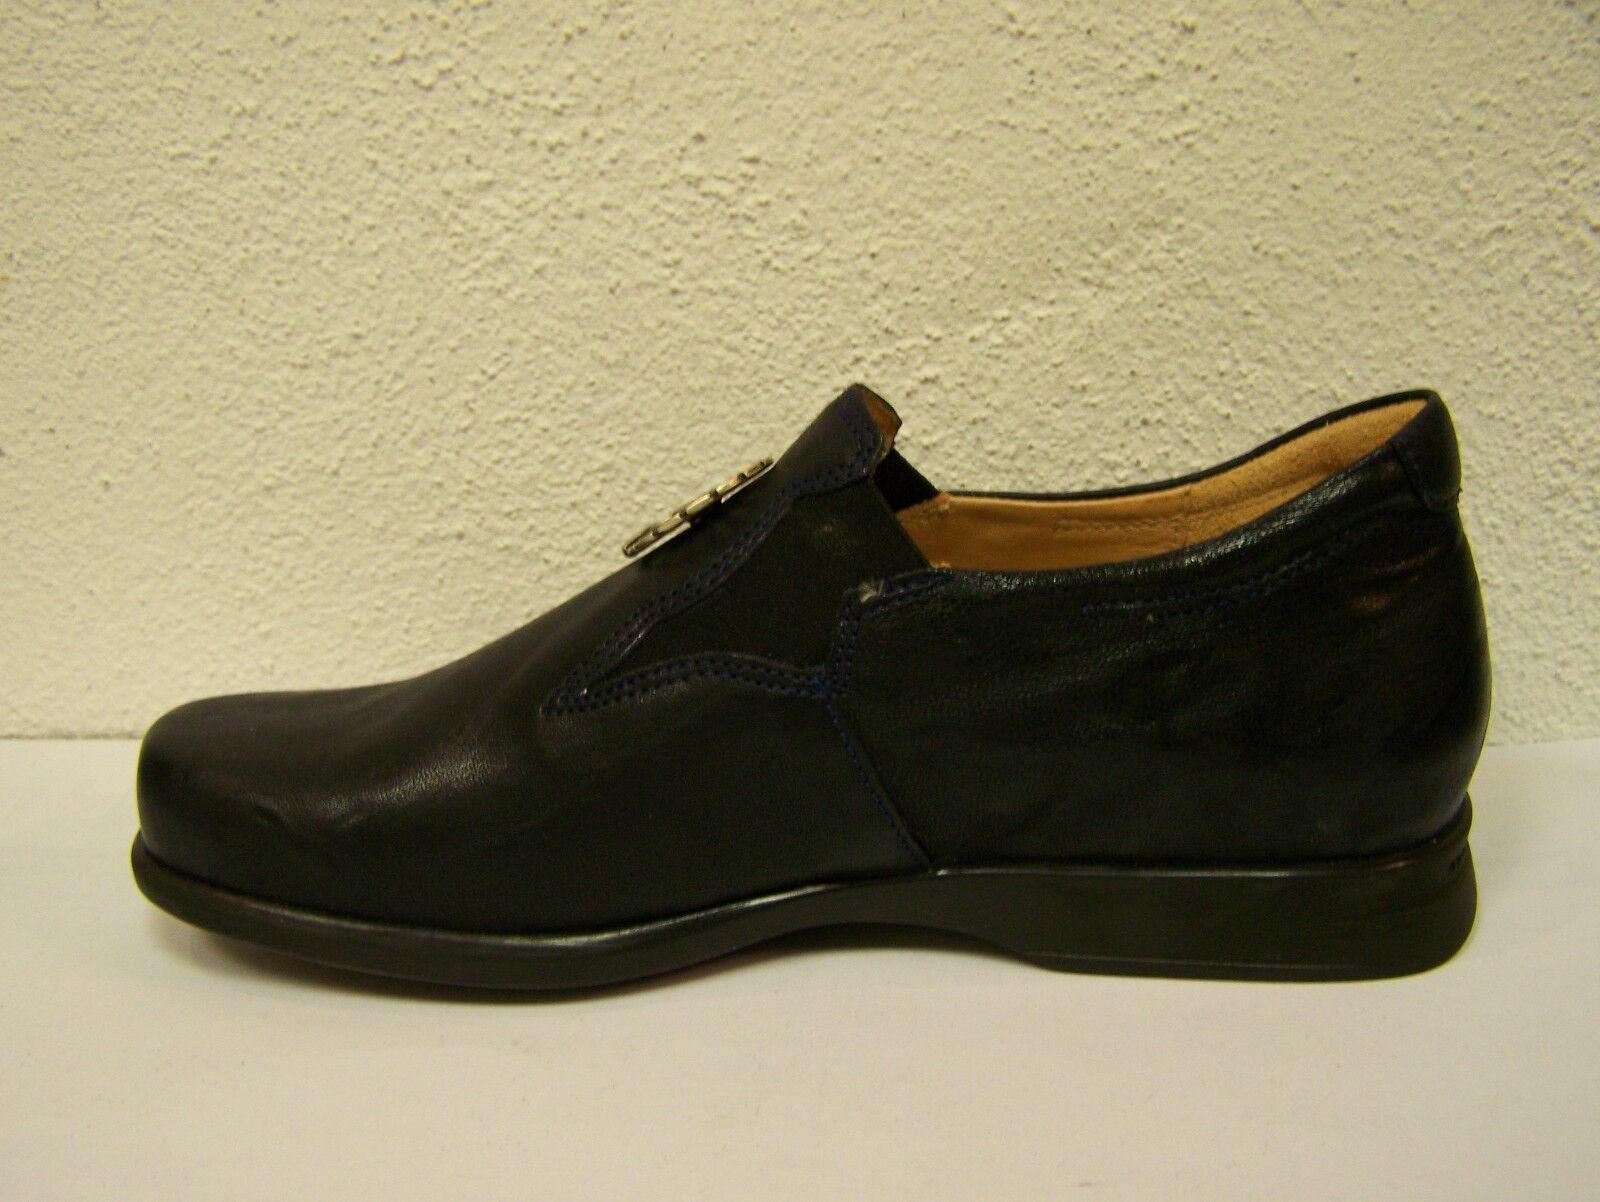 Think! Schuh Pensa dunkelblauer Slipper ozean + Schuhbeutel